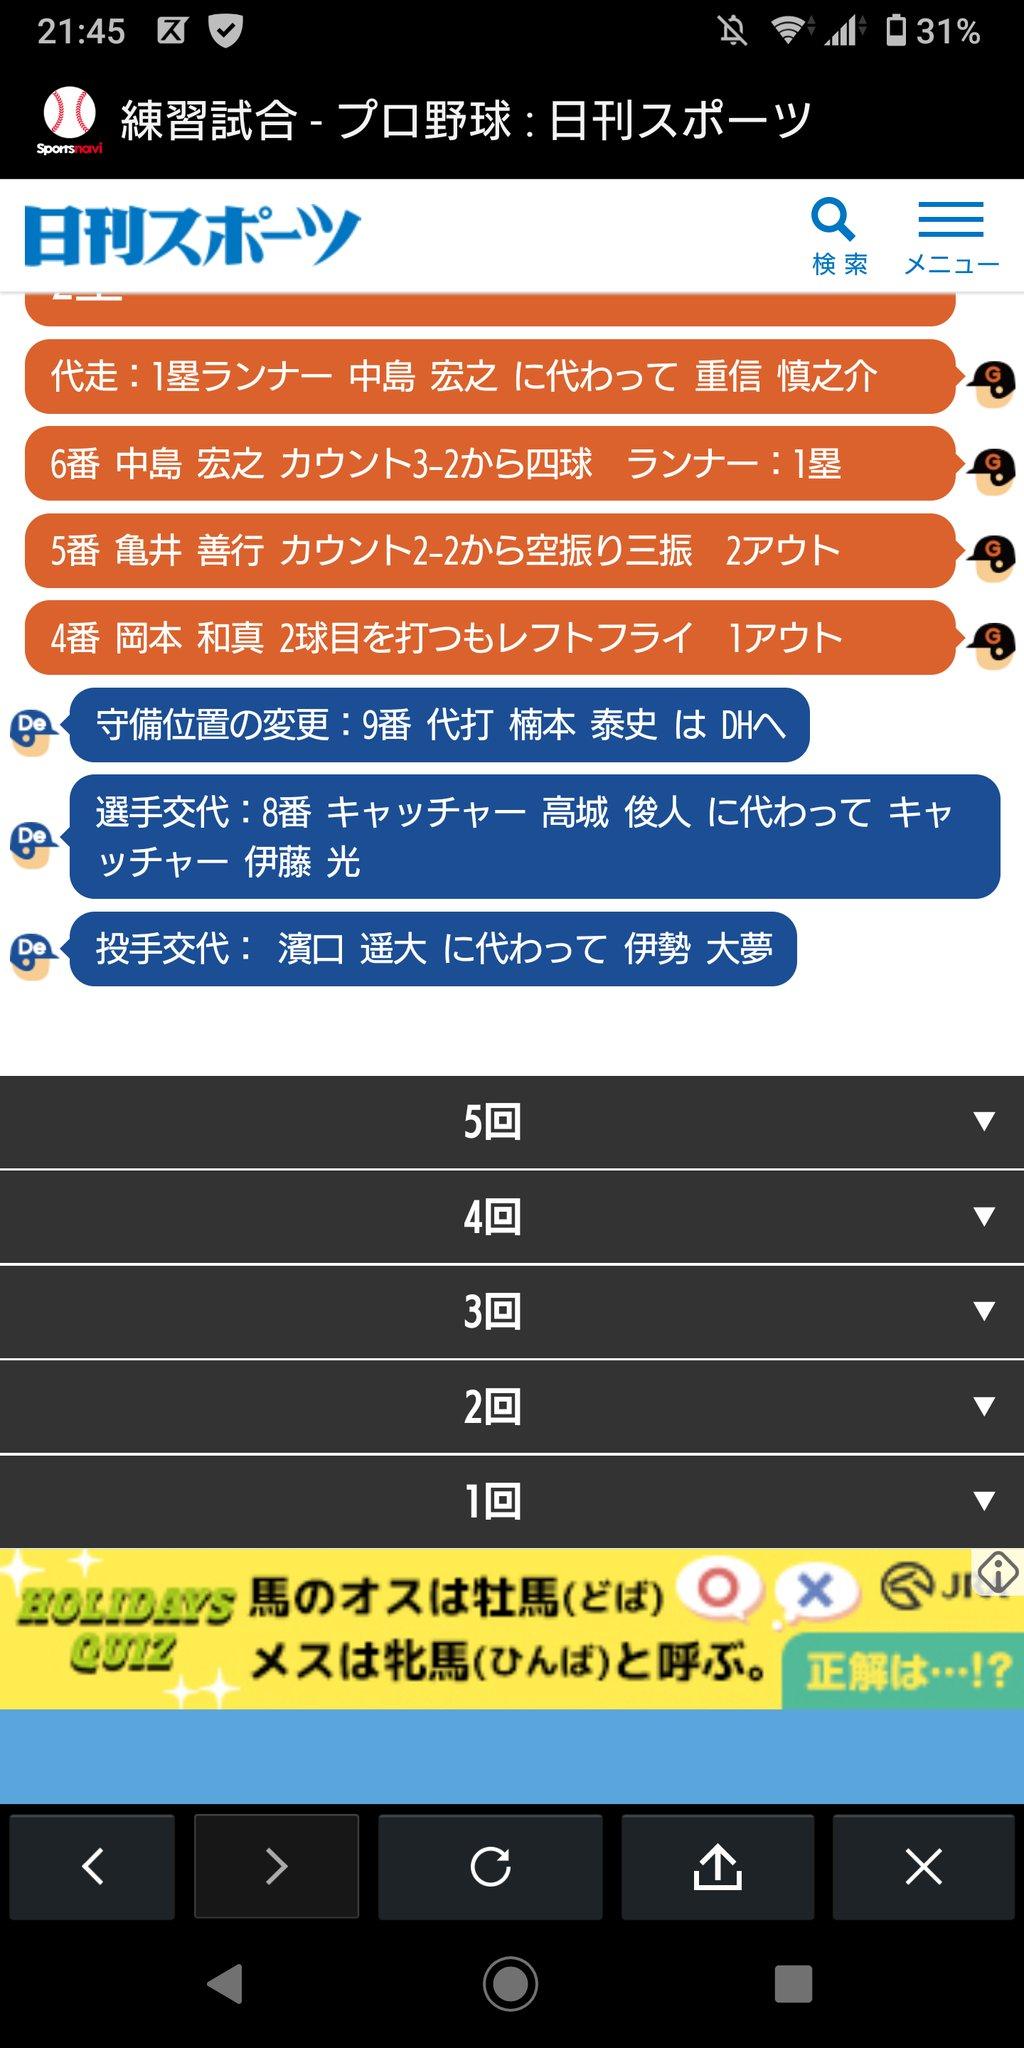 soutei_nikkan.jpg